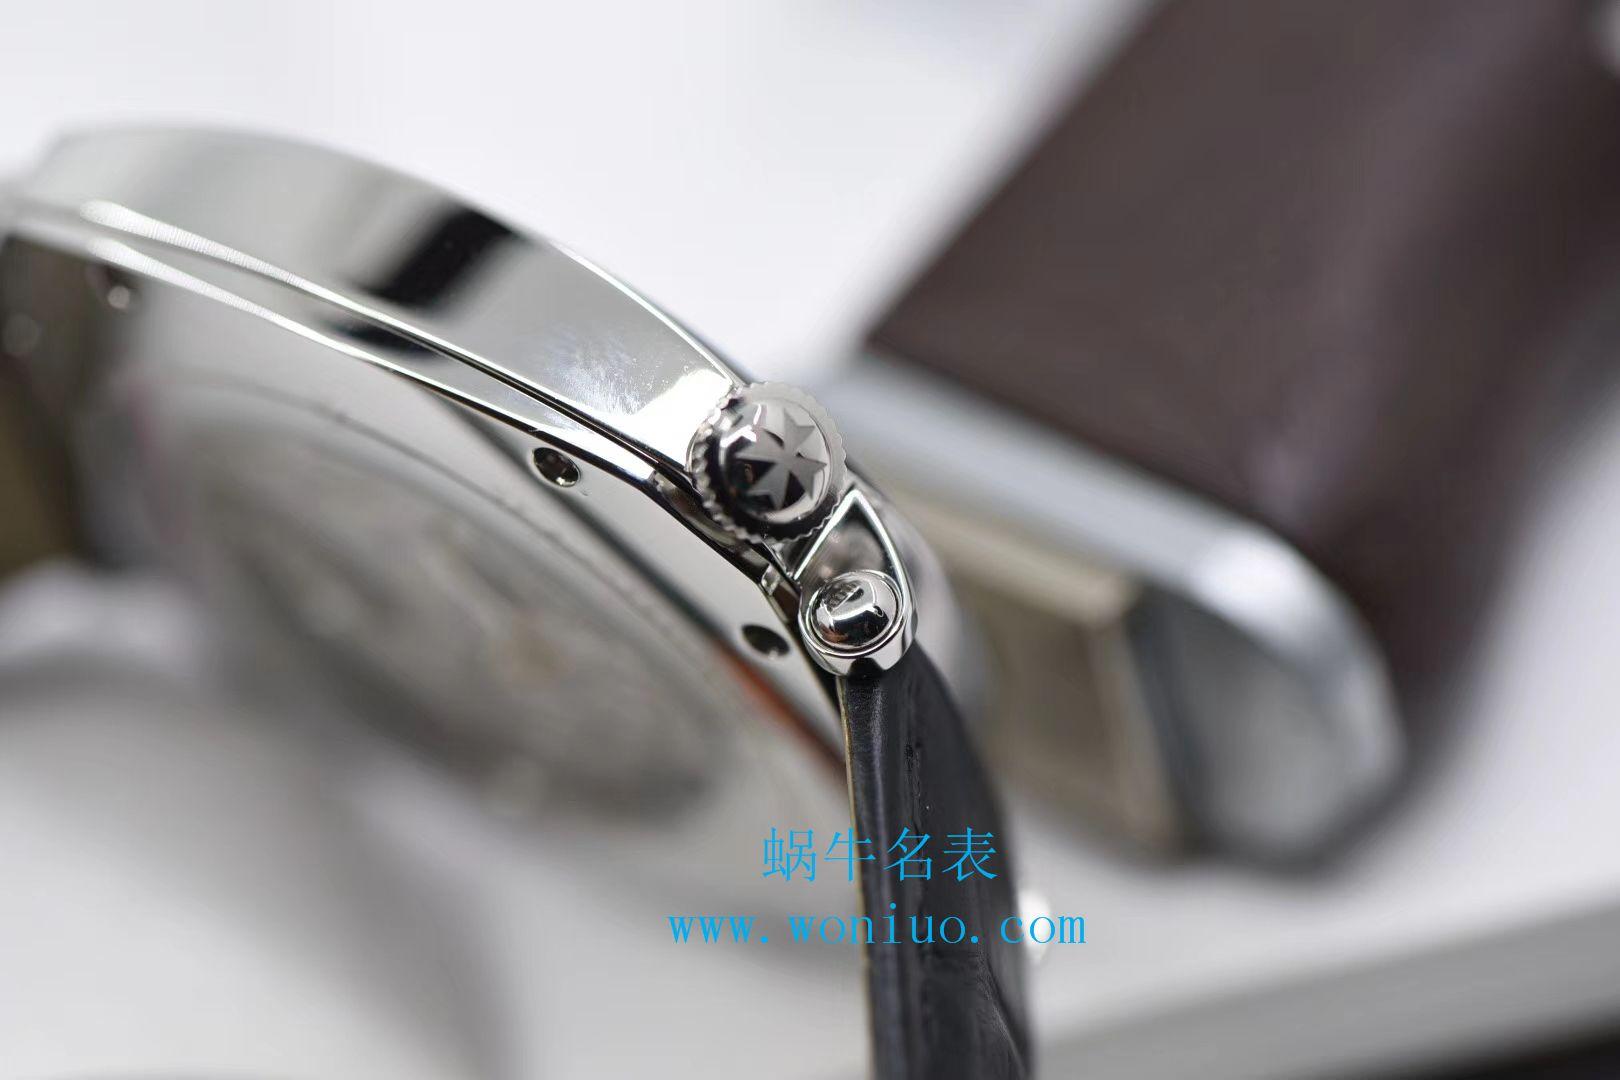 "VC江诗丹顿 历史名作系列 82035/000P-B168  司机表""性价比高,老司机欢迎把玩"